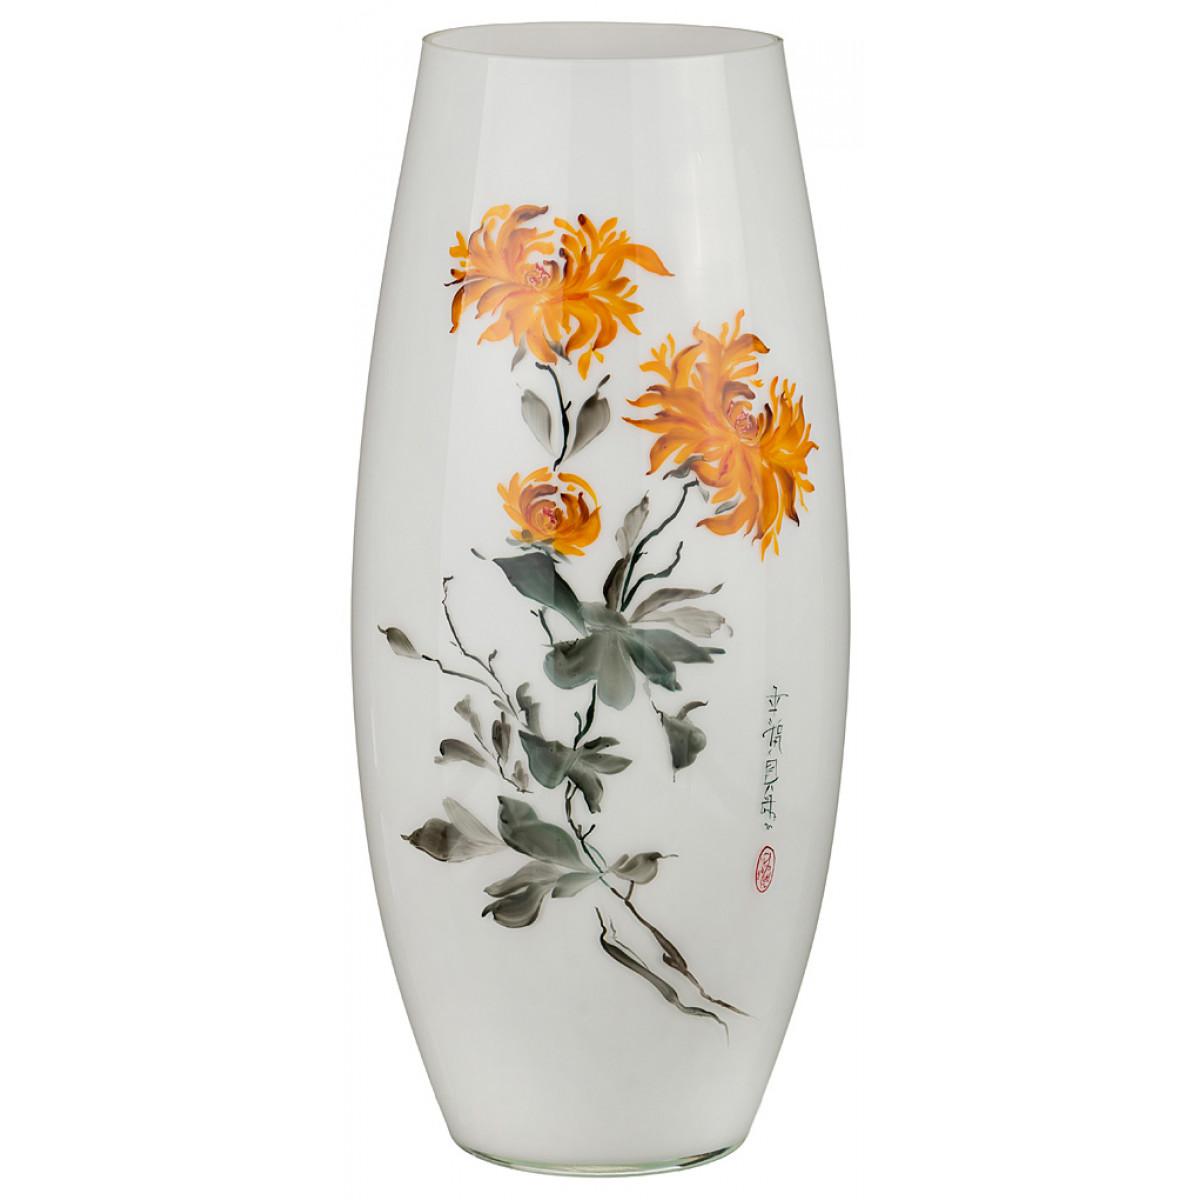 {} Arti-M Ваза Tillie  (19х40 см) ваза 19 см bernadotte ваза 19 см